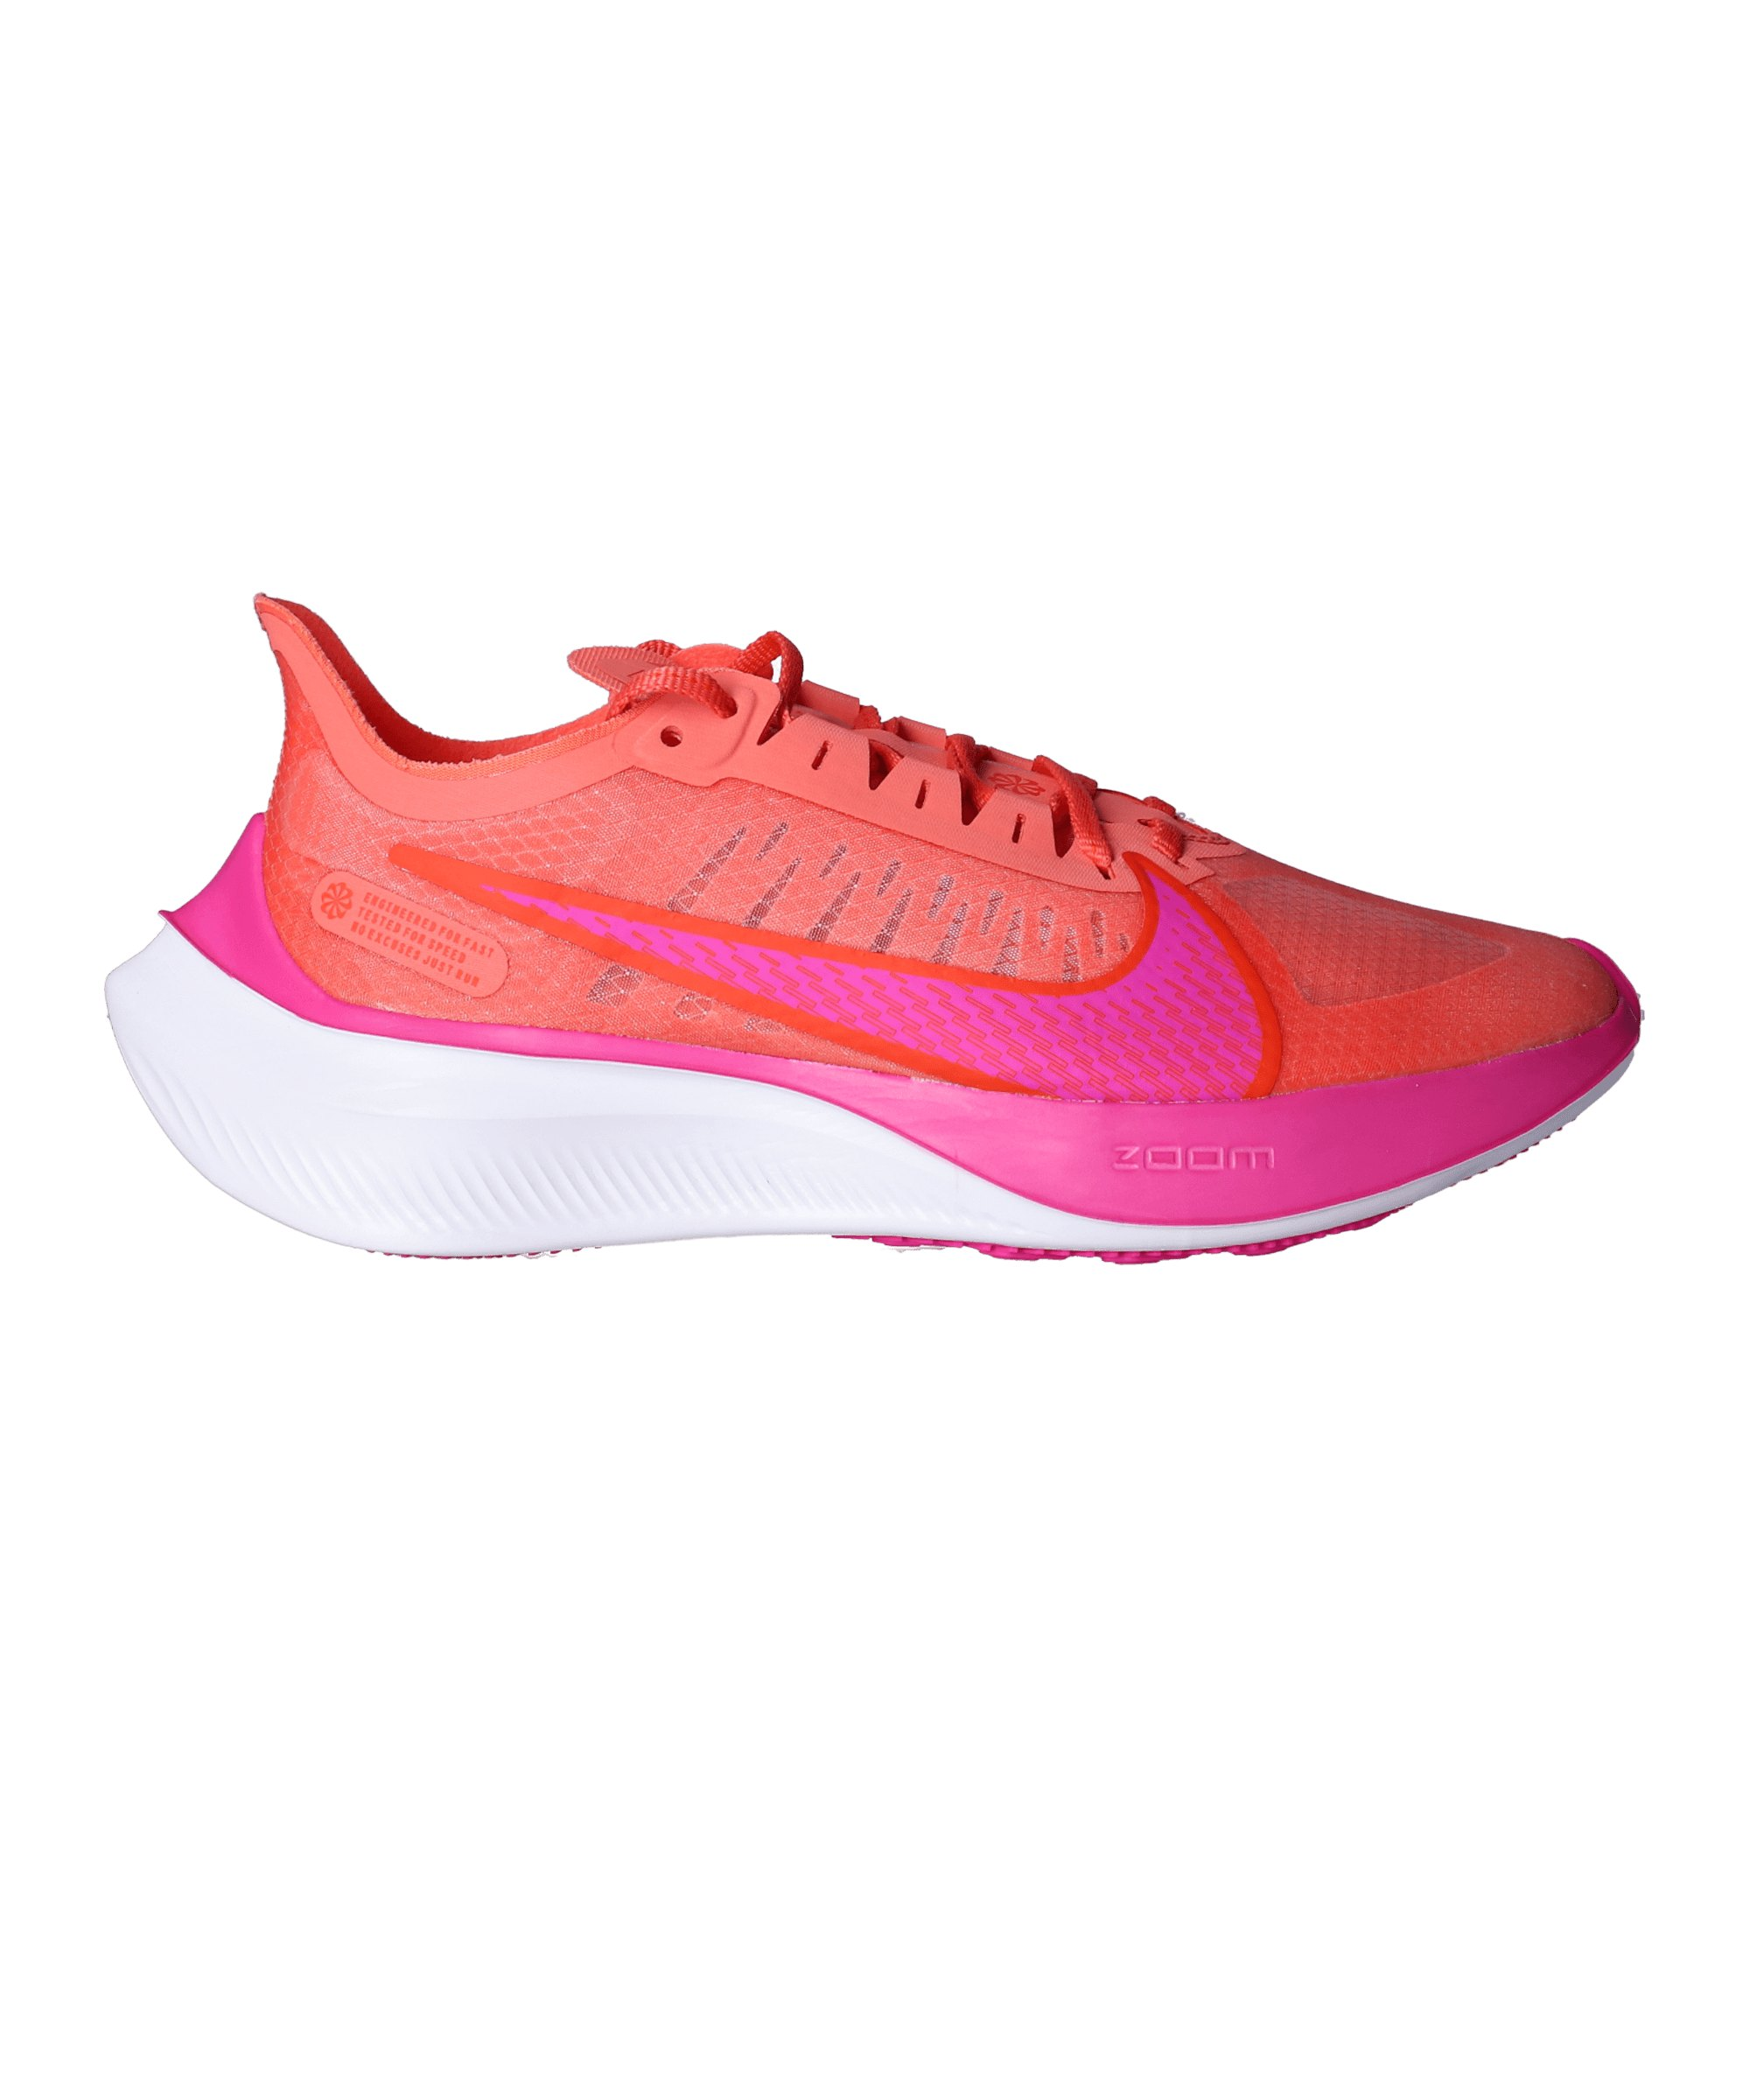 Nike Zoom Gravity Running Damen Rot F800 - pink